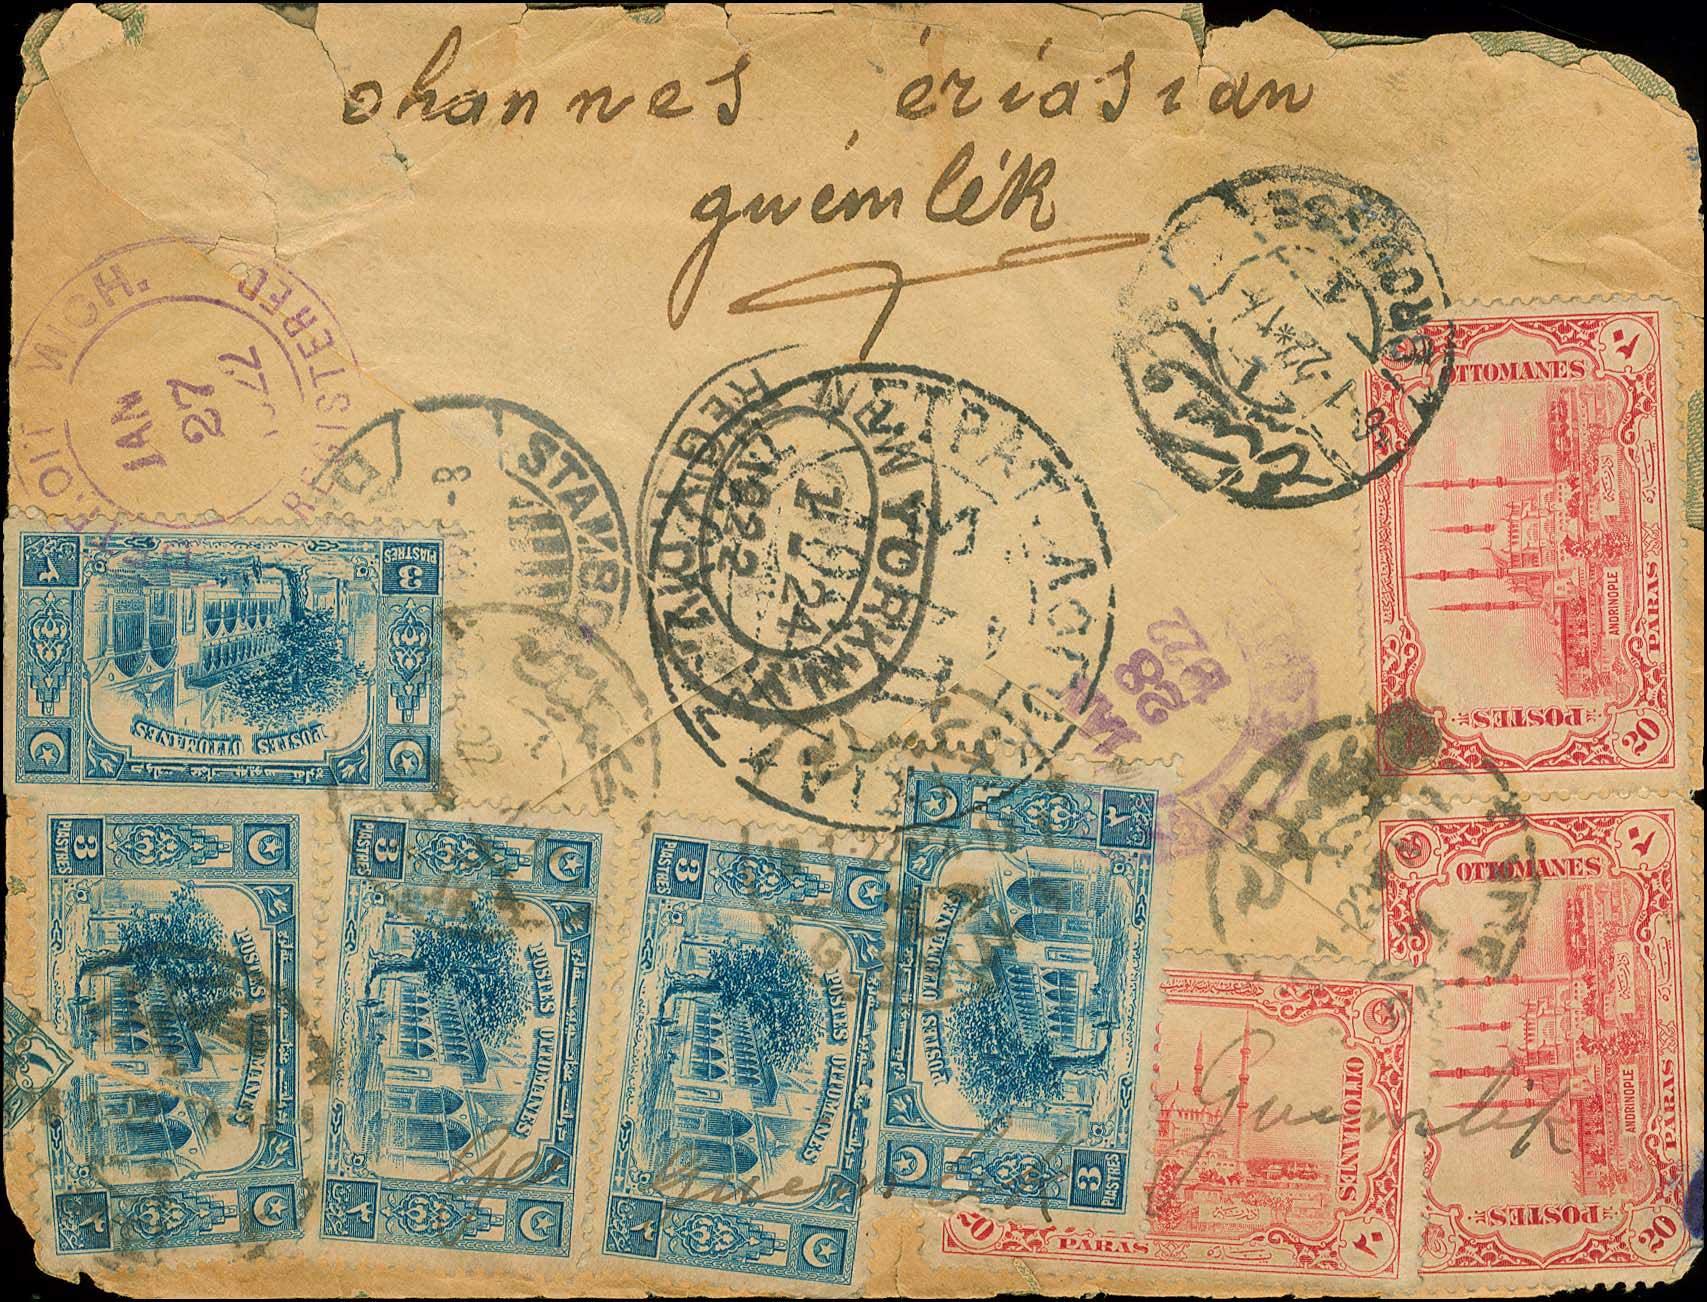 Lot 873 - -  SMYRNE,CONS/PLE & ASIA MINOR (before 1922) SMYRNE,CONS/PLE & ASIA MINOR (before 1922) -  A. Karamitsos Public & Live Internet Auction 675